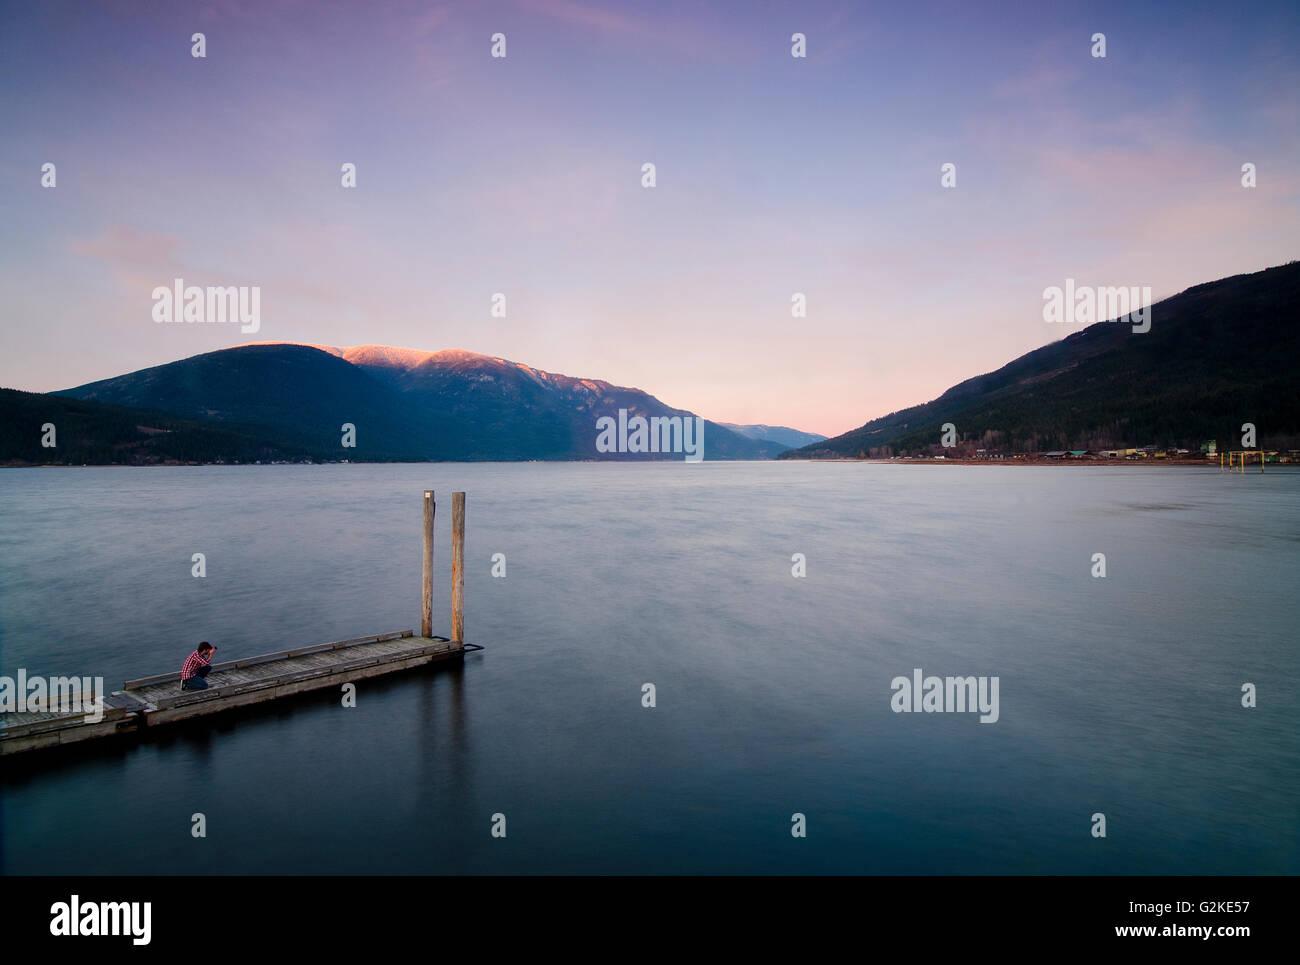 Photographer shoots on public access wharf on Shuswap Lake sunset near Salmon Arm in Shuswap region British Columbia - Stock Image